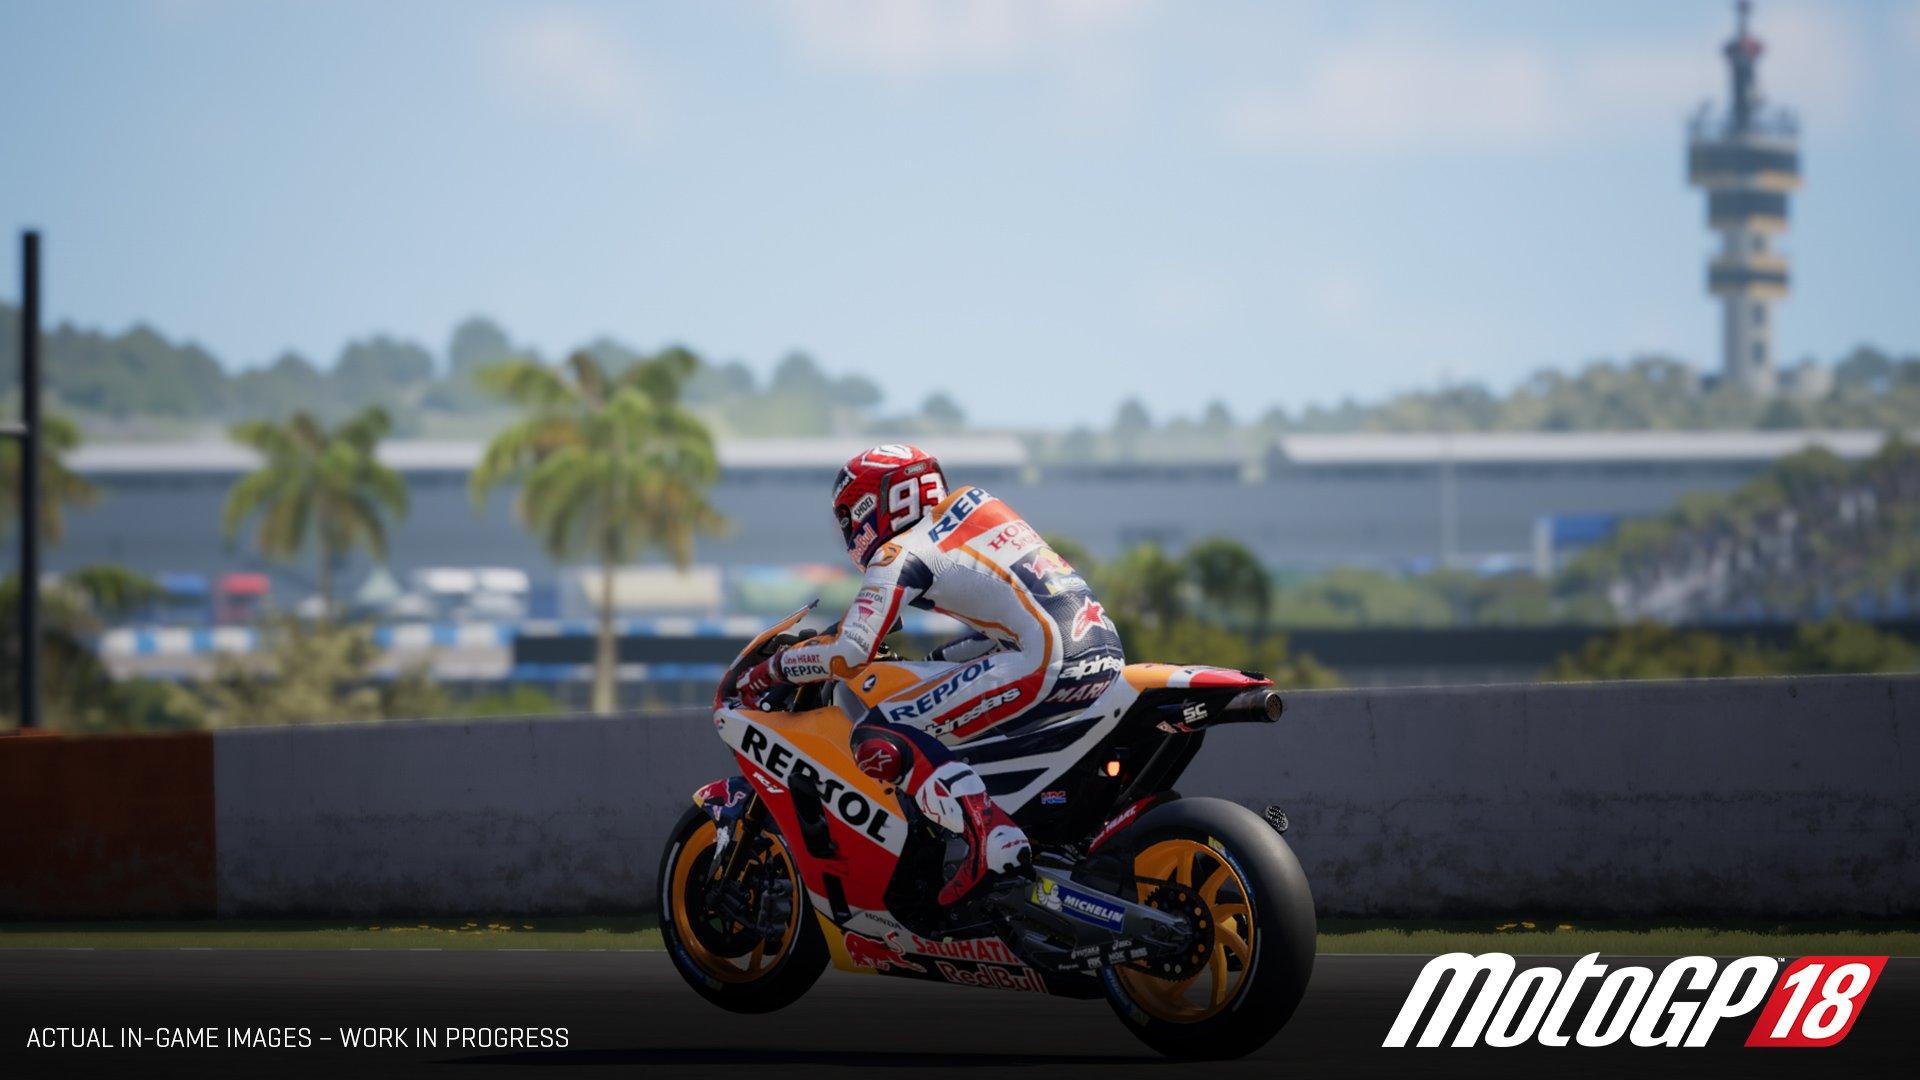 MotoGP 18 preview 10